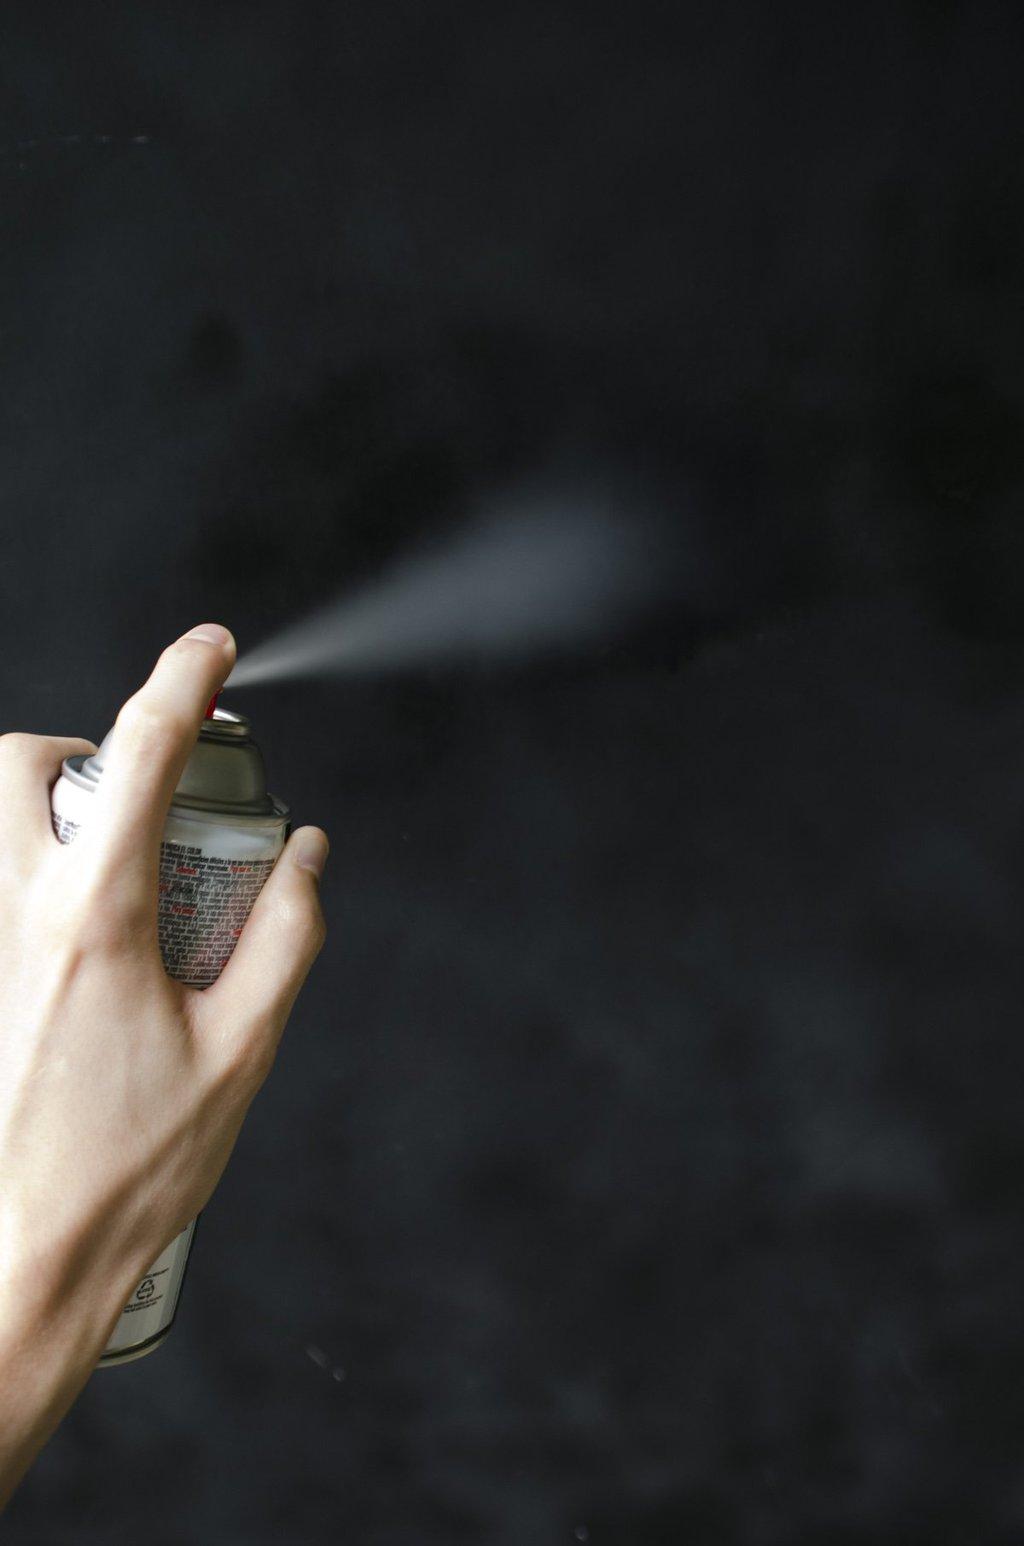 Krylon Super Maxx All-in-One spray paint via @thouswellblog